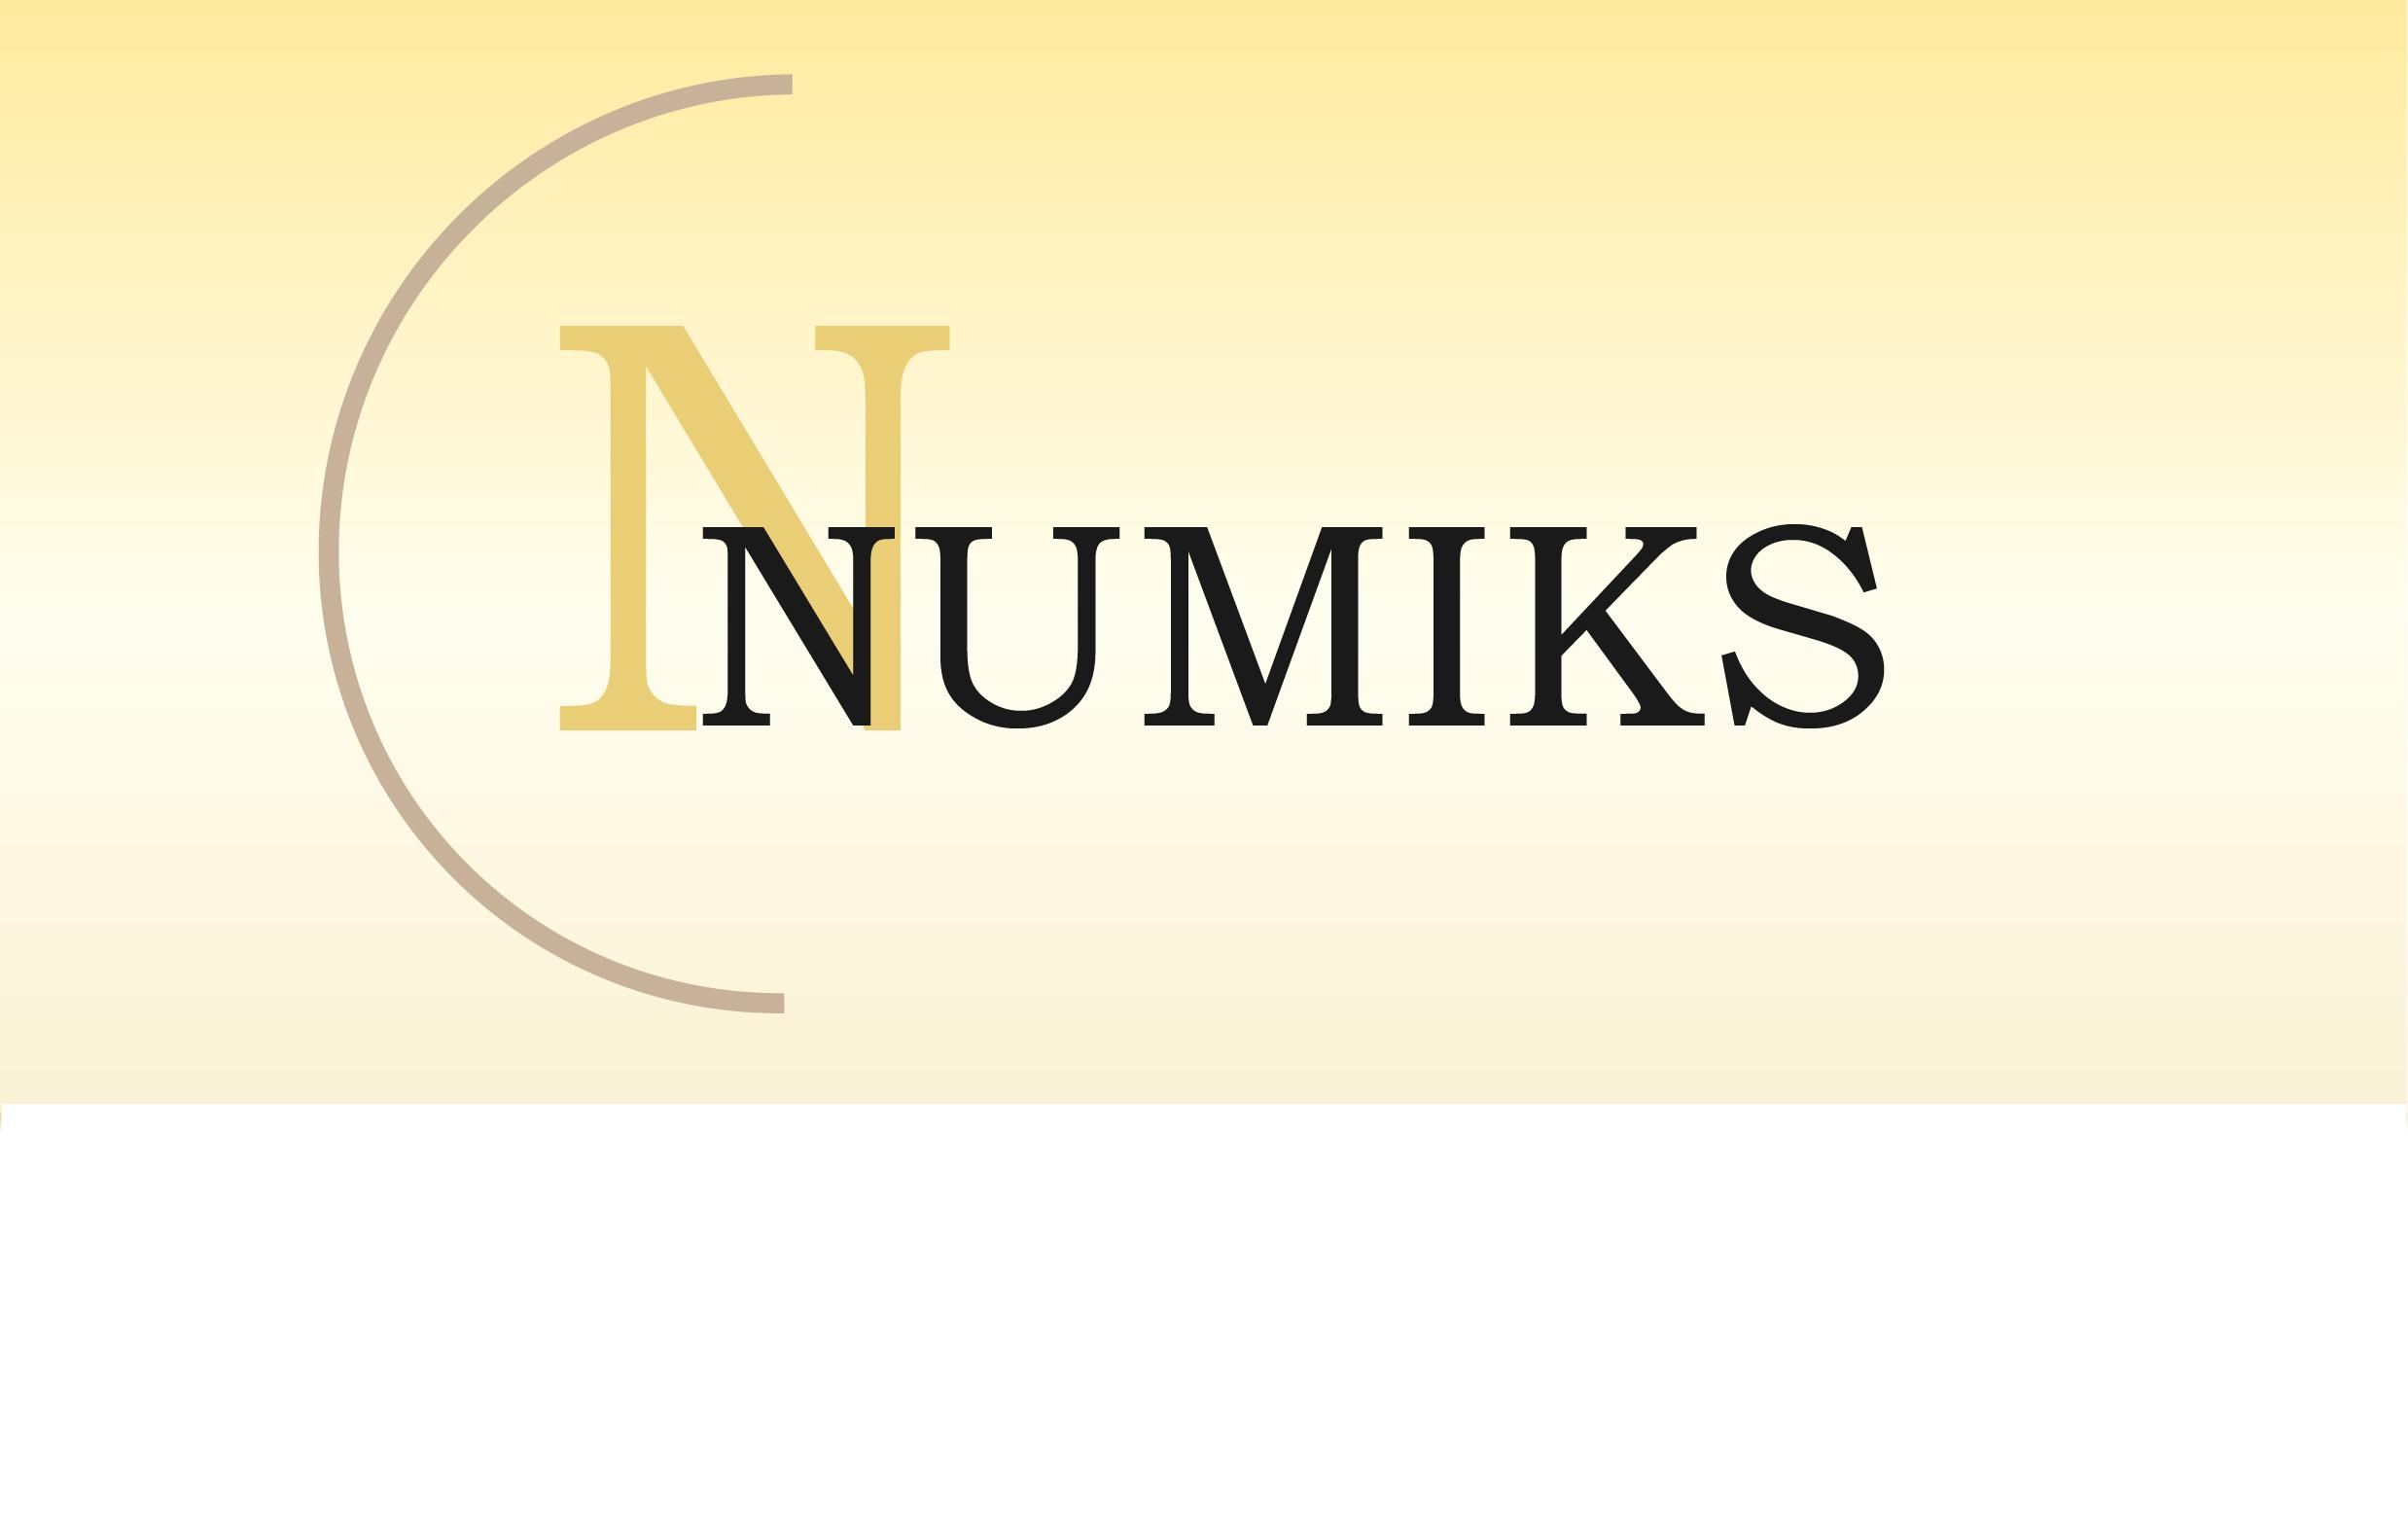 Логотип для интернет-магазина фото f_6465ec66b55f3ec4.jpg